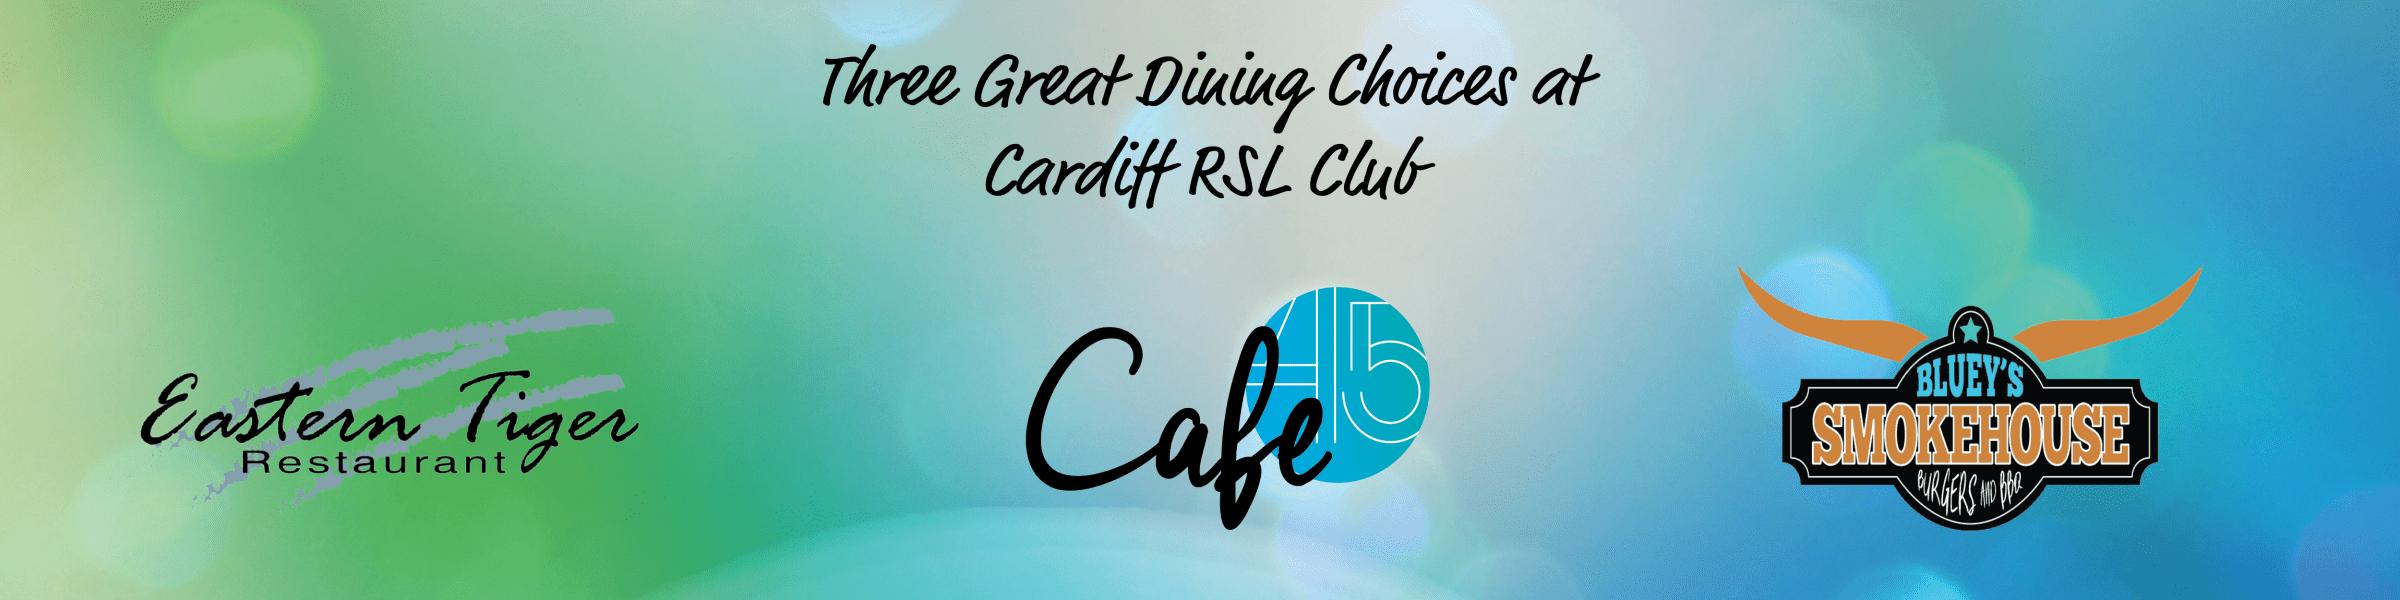 Cardiff RSL Club - Dining Venues